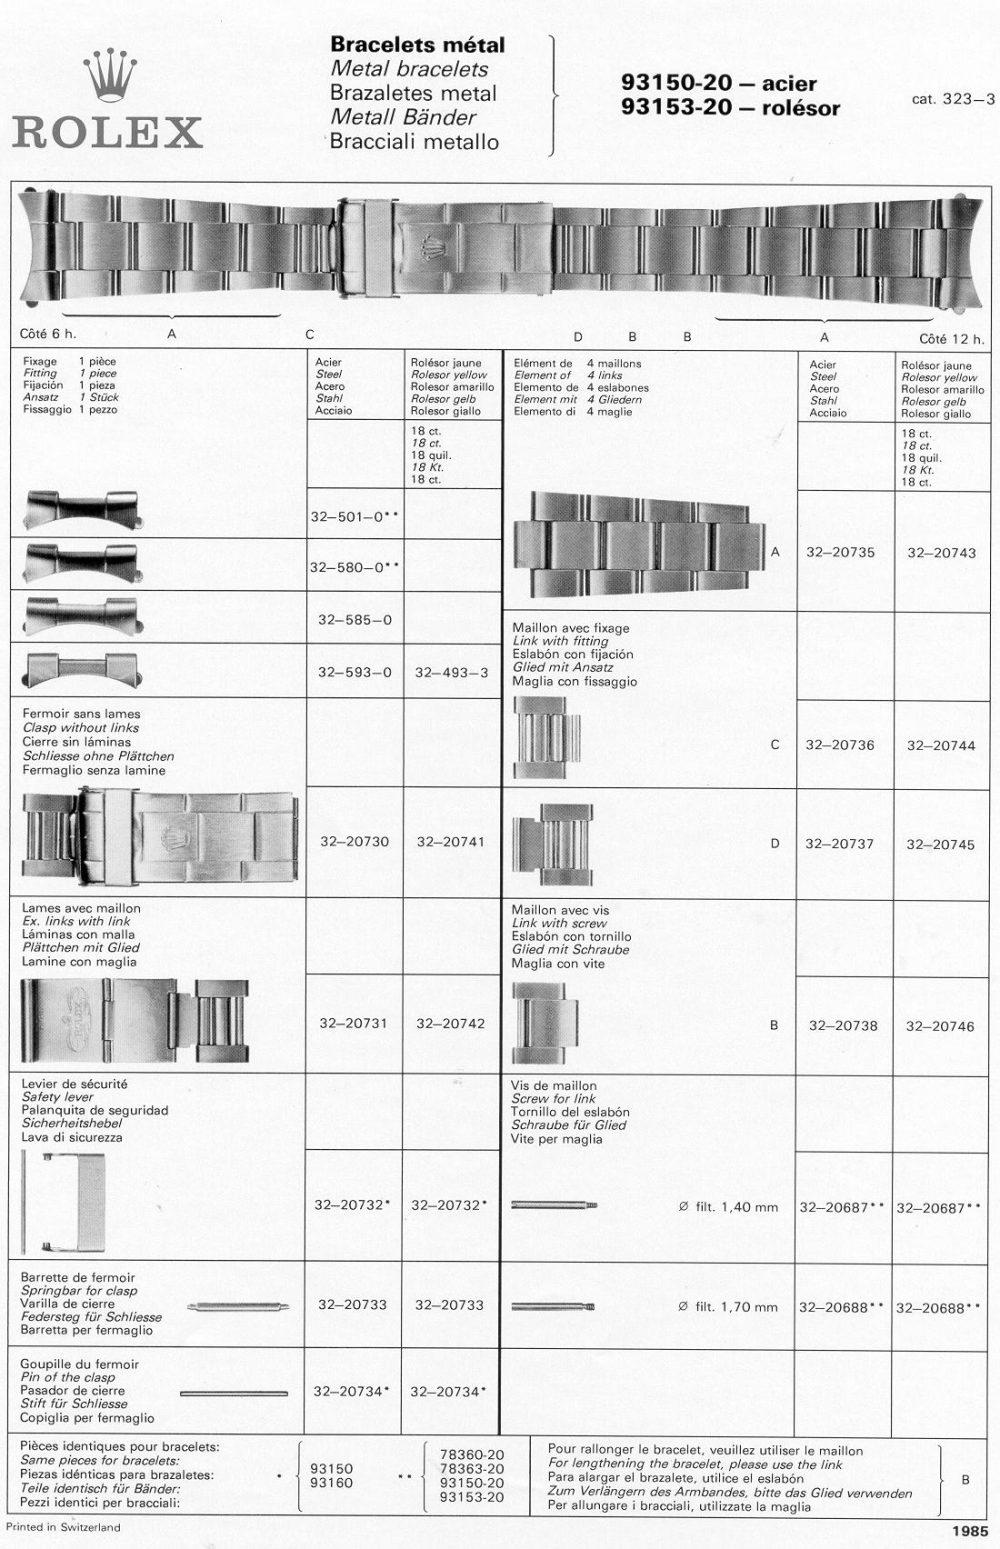 Rolex Bracelet sheet information